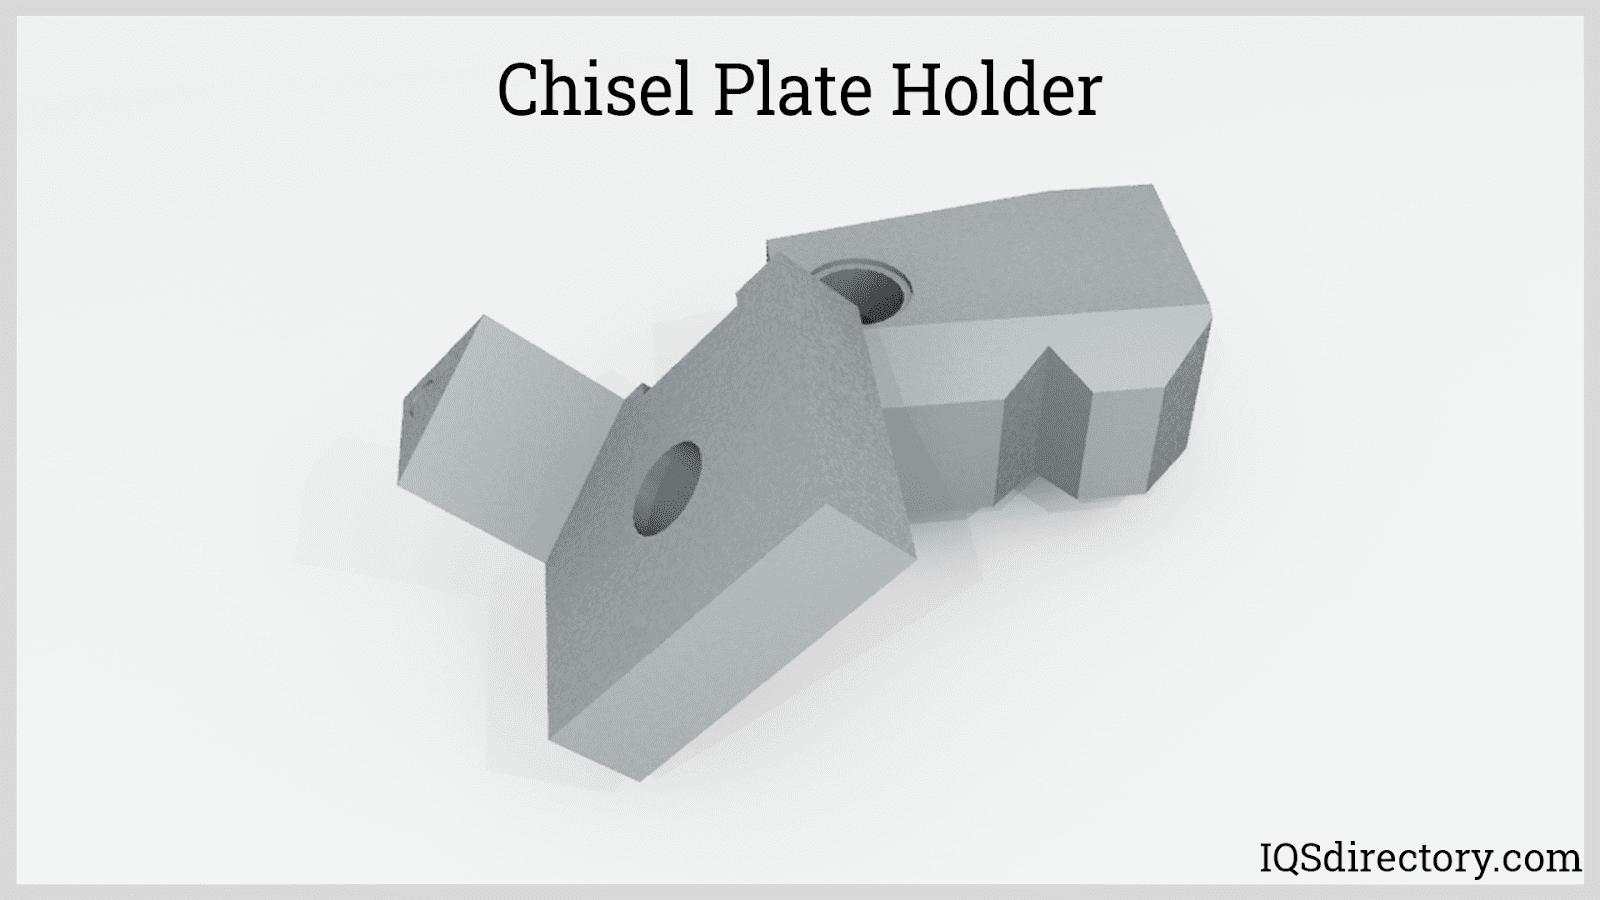 Chisel Plate Holder